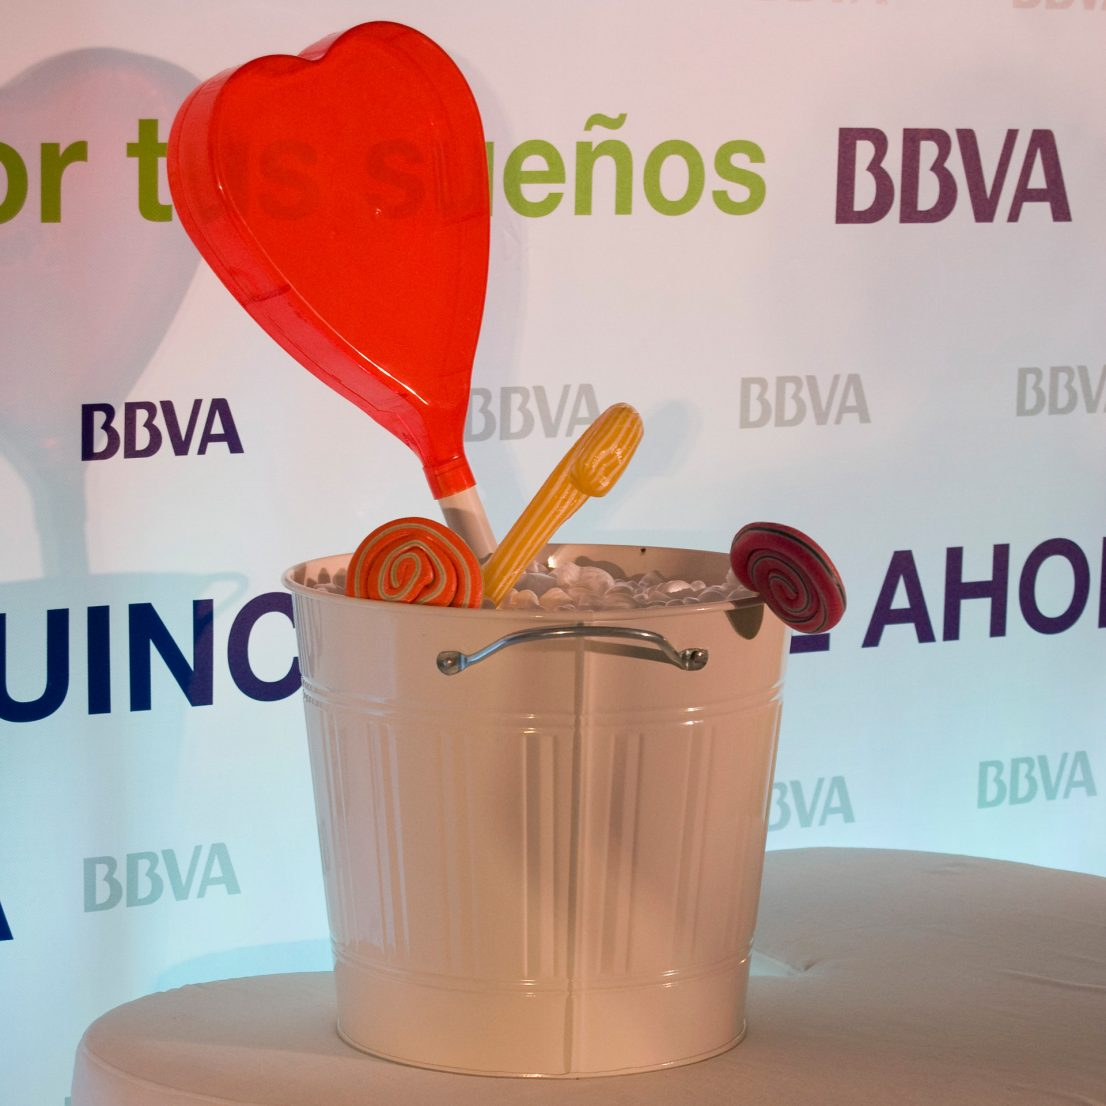 Escenografia atrezzo evento presentacion Quincena Ahorro BBVA Agatha Ruiz de la Prada